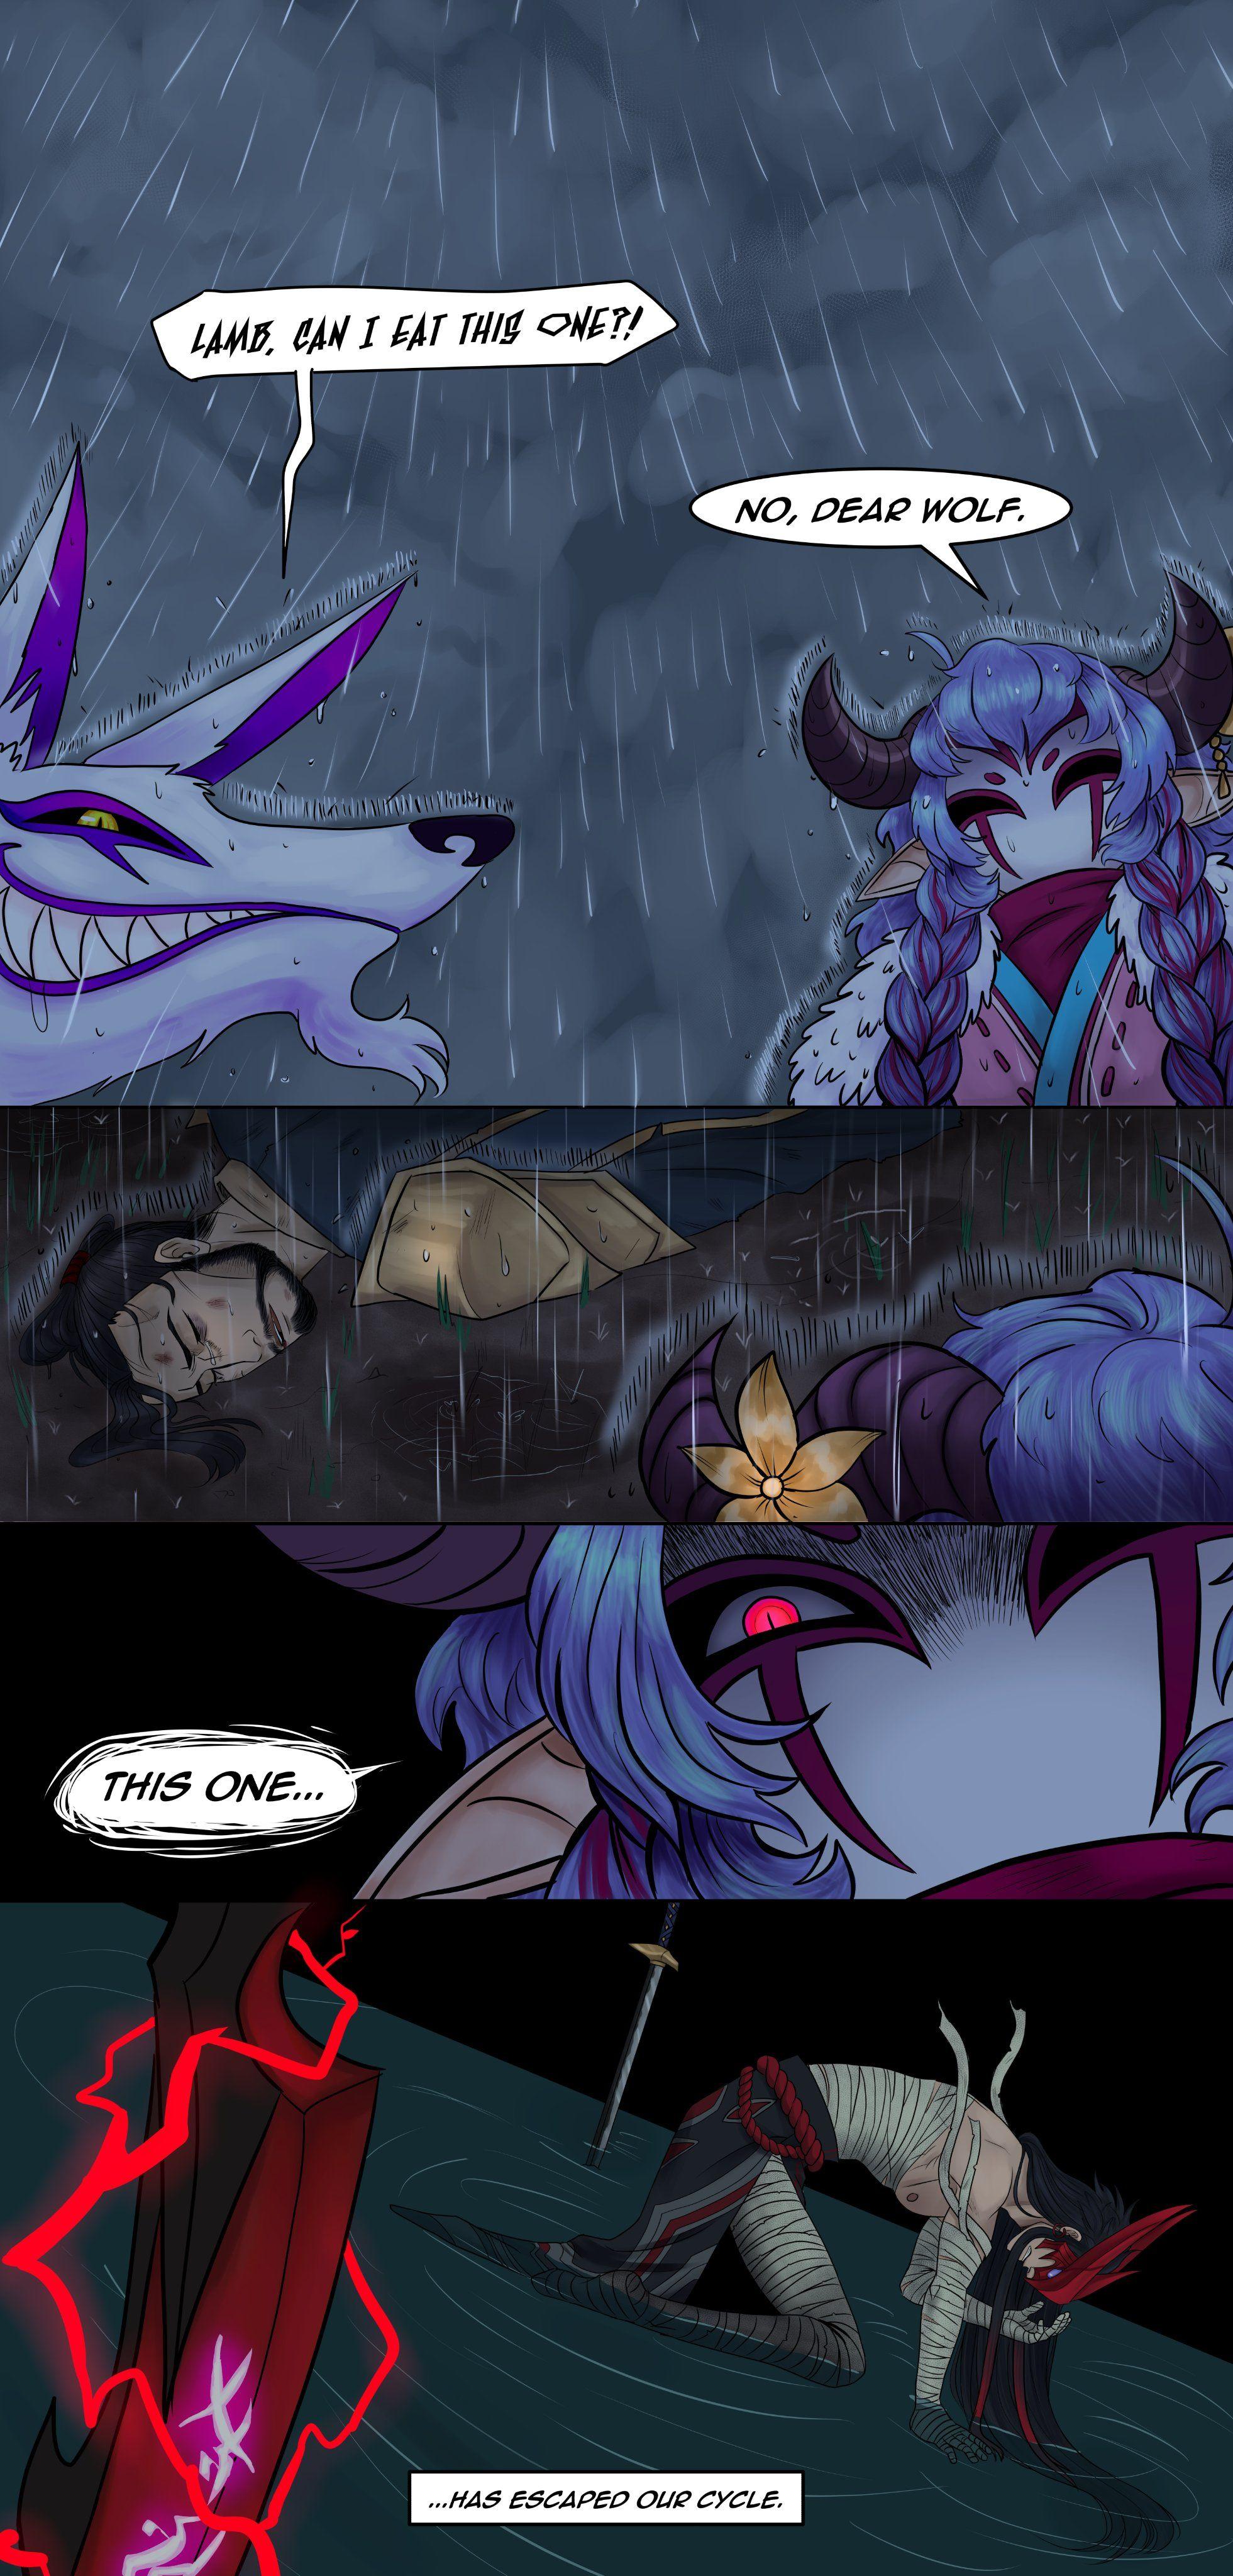 Pin By Xuanˆˆ On Digital Art League Of Legends Yasuo Lol League Of Legends League Of Legends Memes